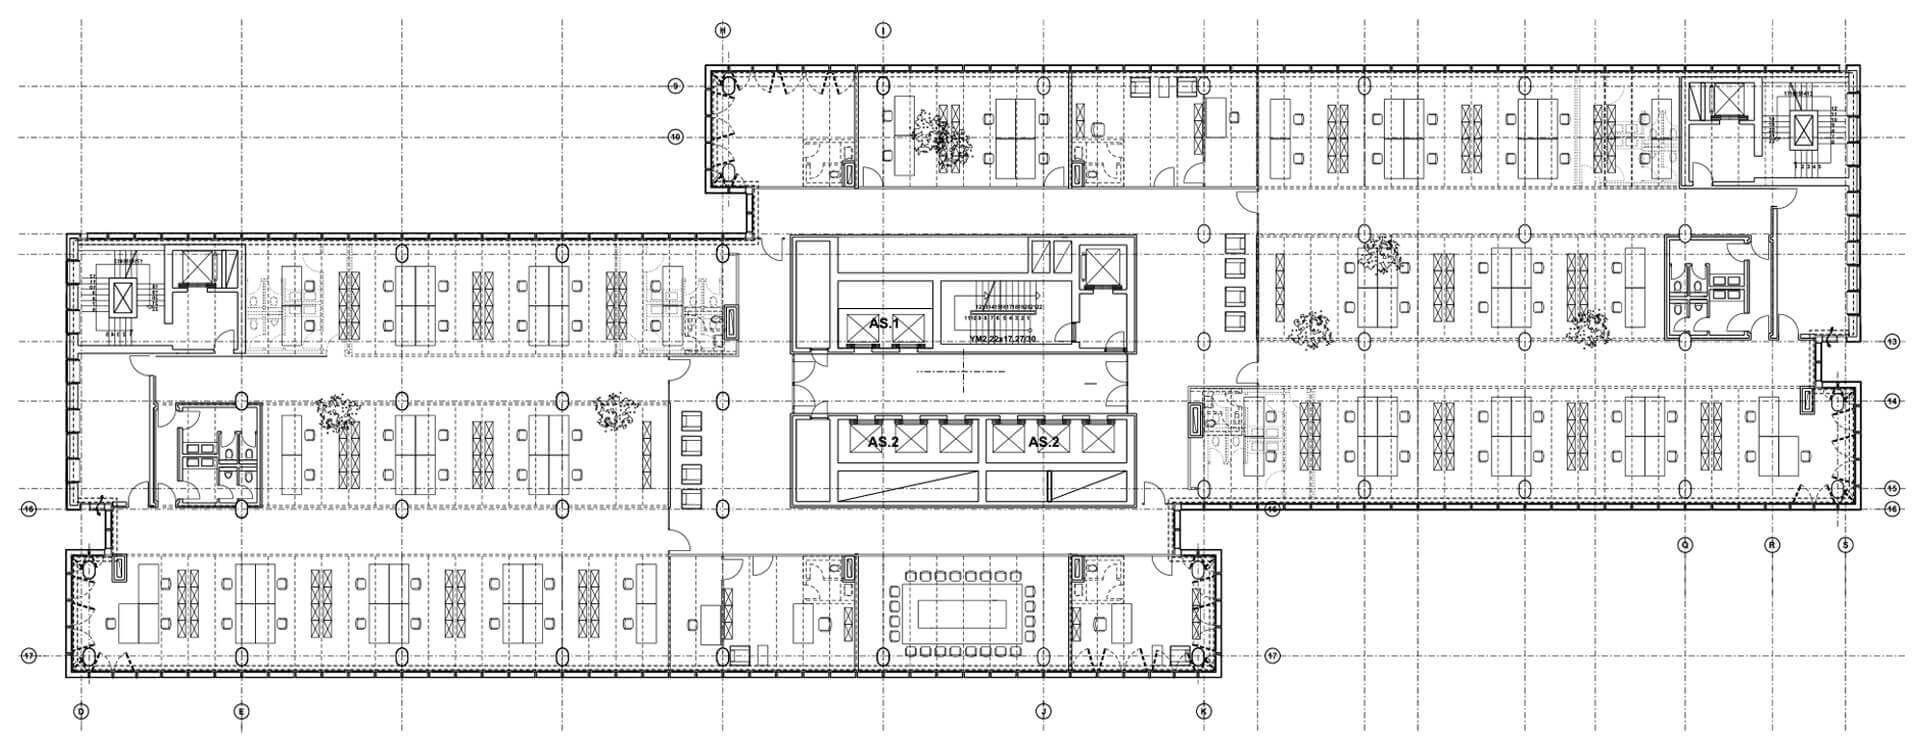 Orjin maslak plaza sop architekten office bldg for Innenarchitektur studium karlsruhe